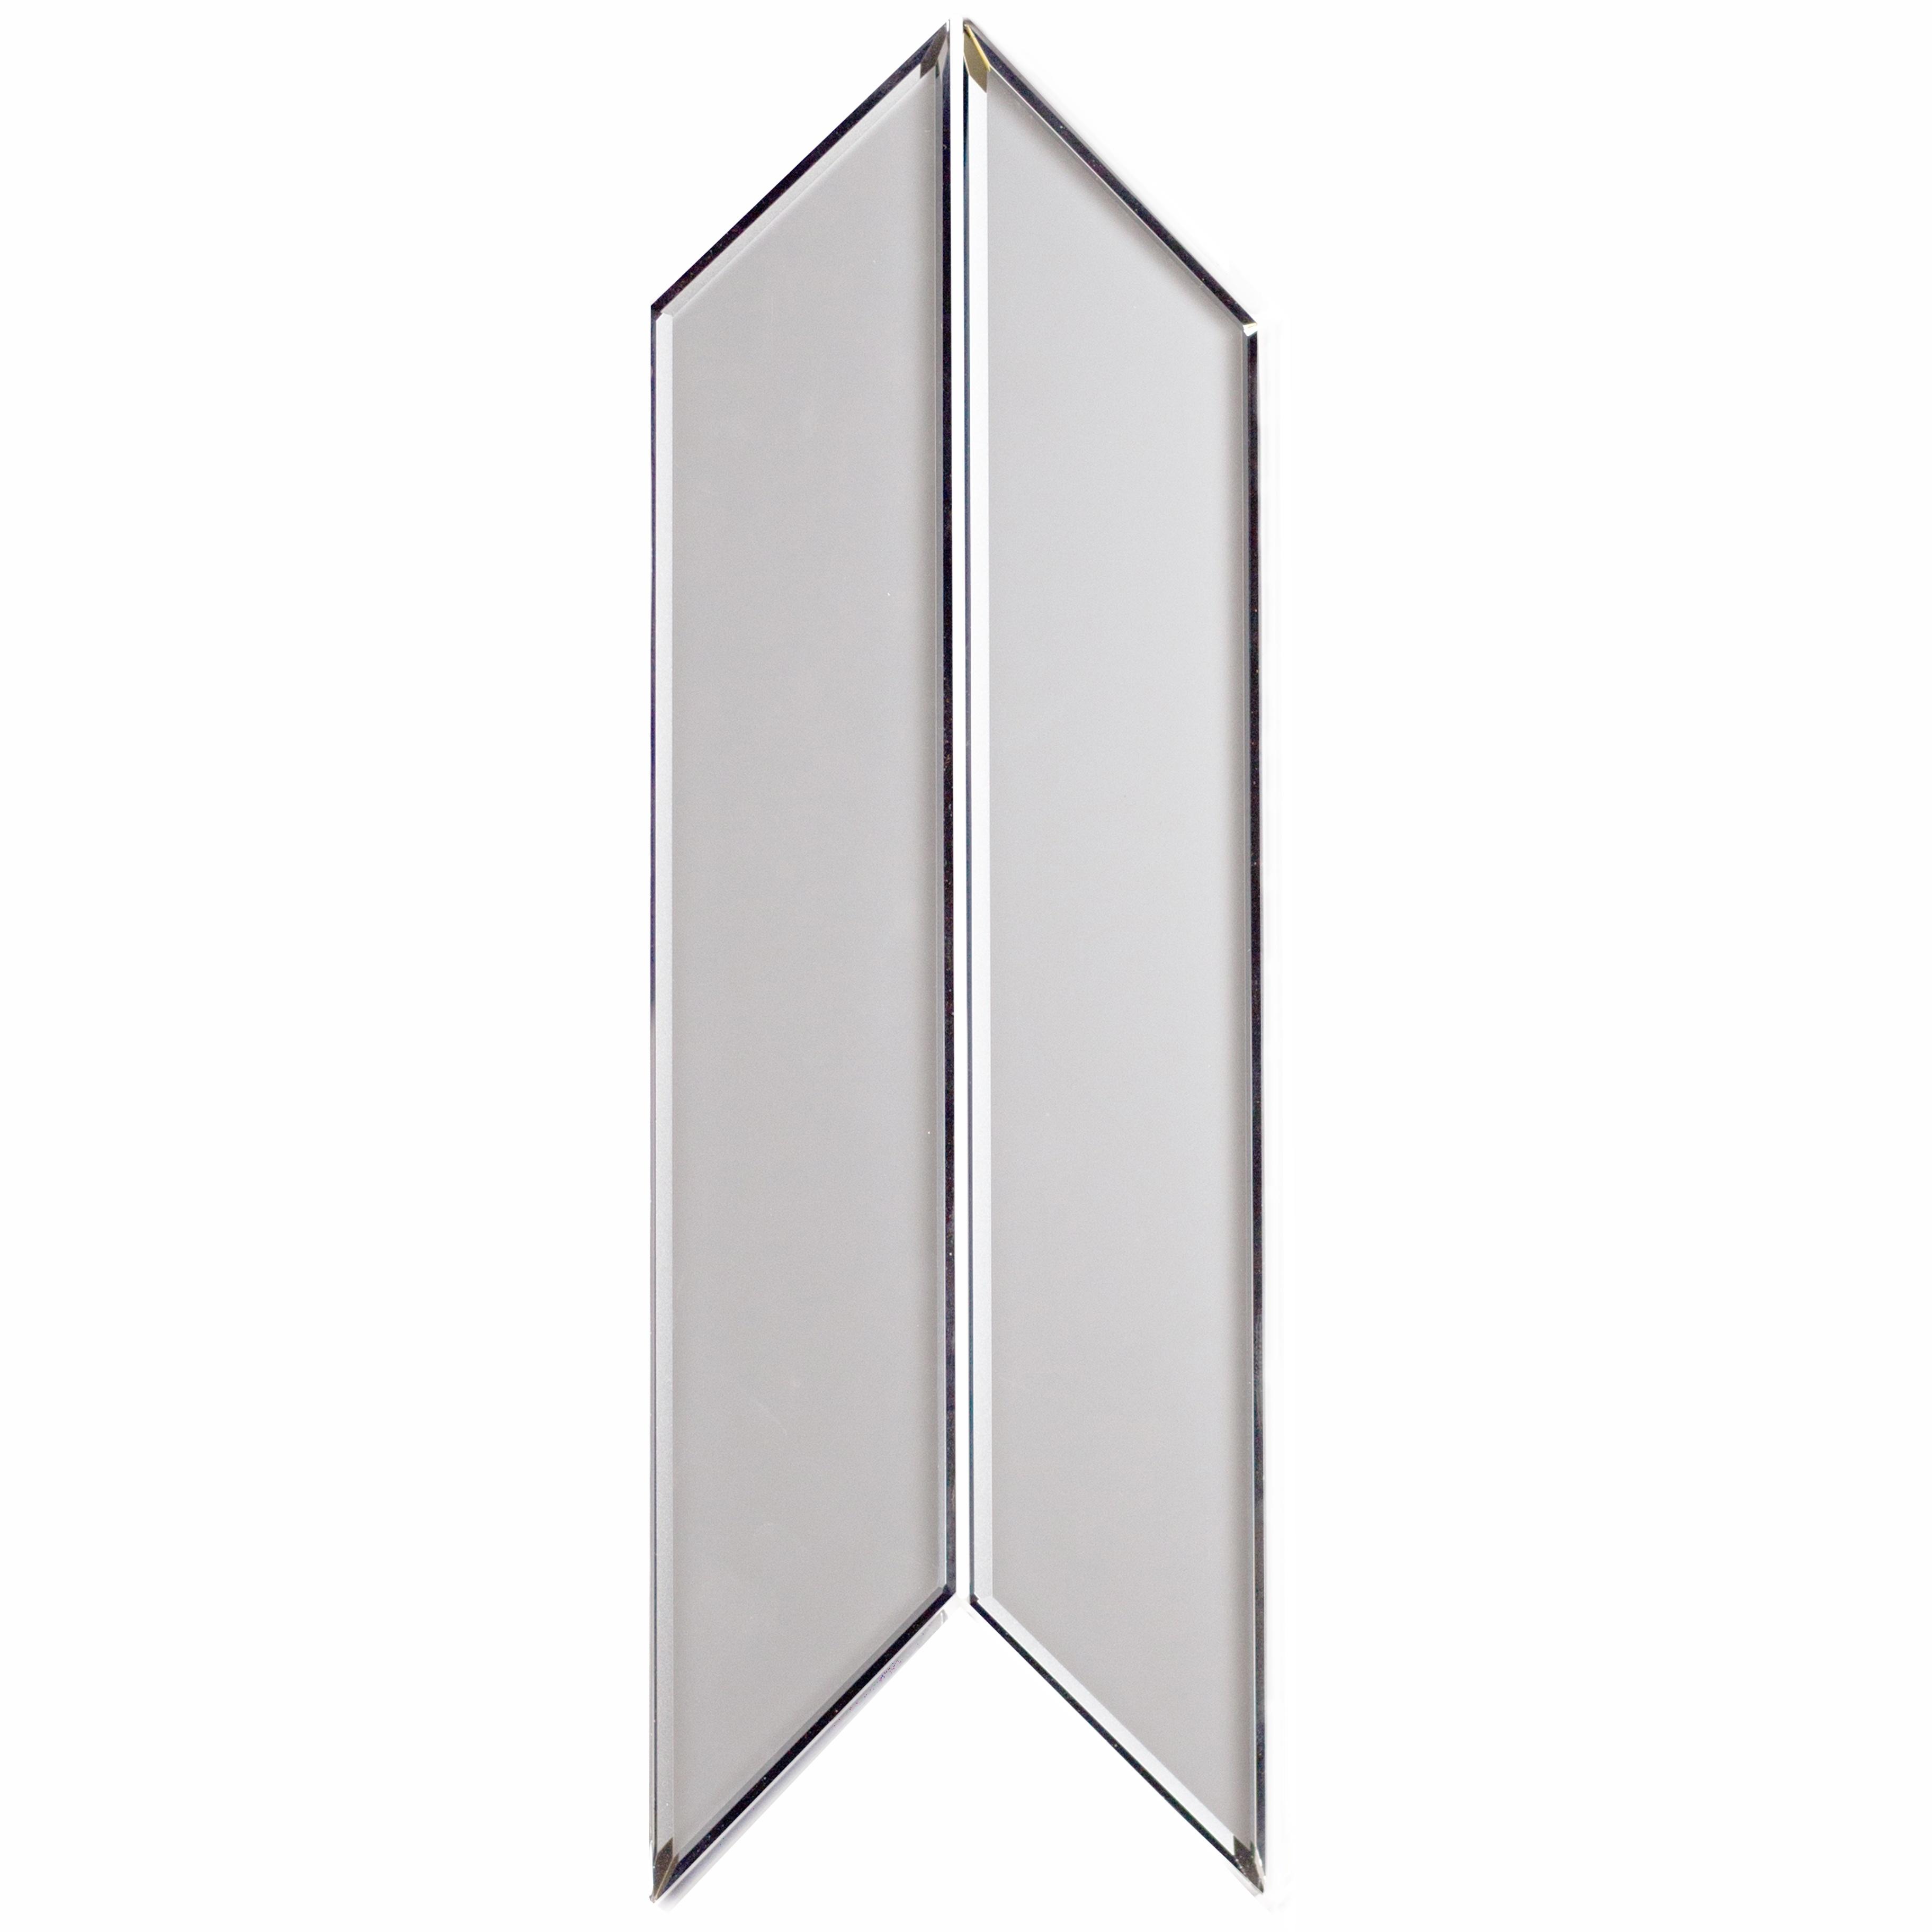 "Reflections 3.75"" x 11.75"" Matte Silver Mirror Diamond Pair Backsplash Wall Tile"